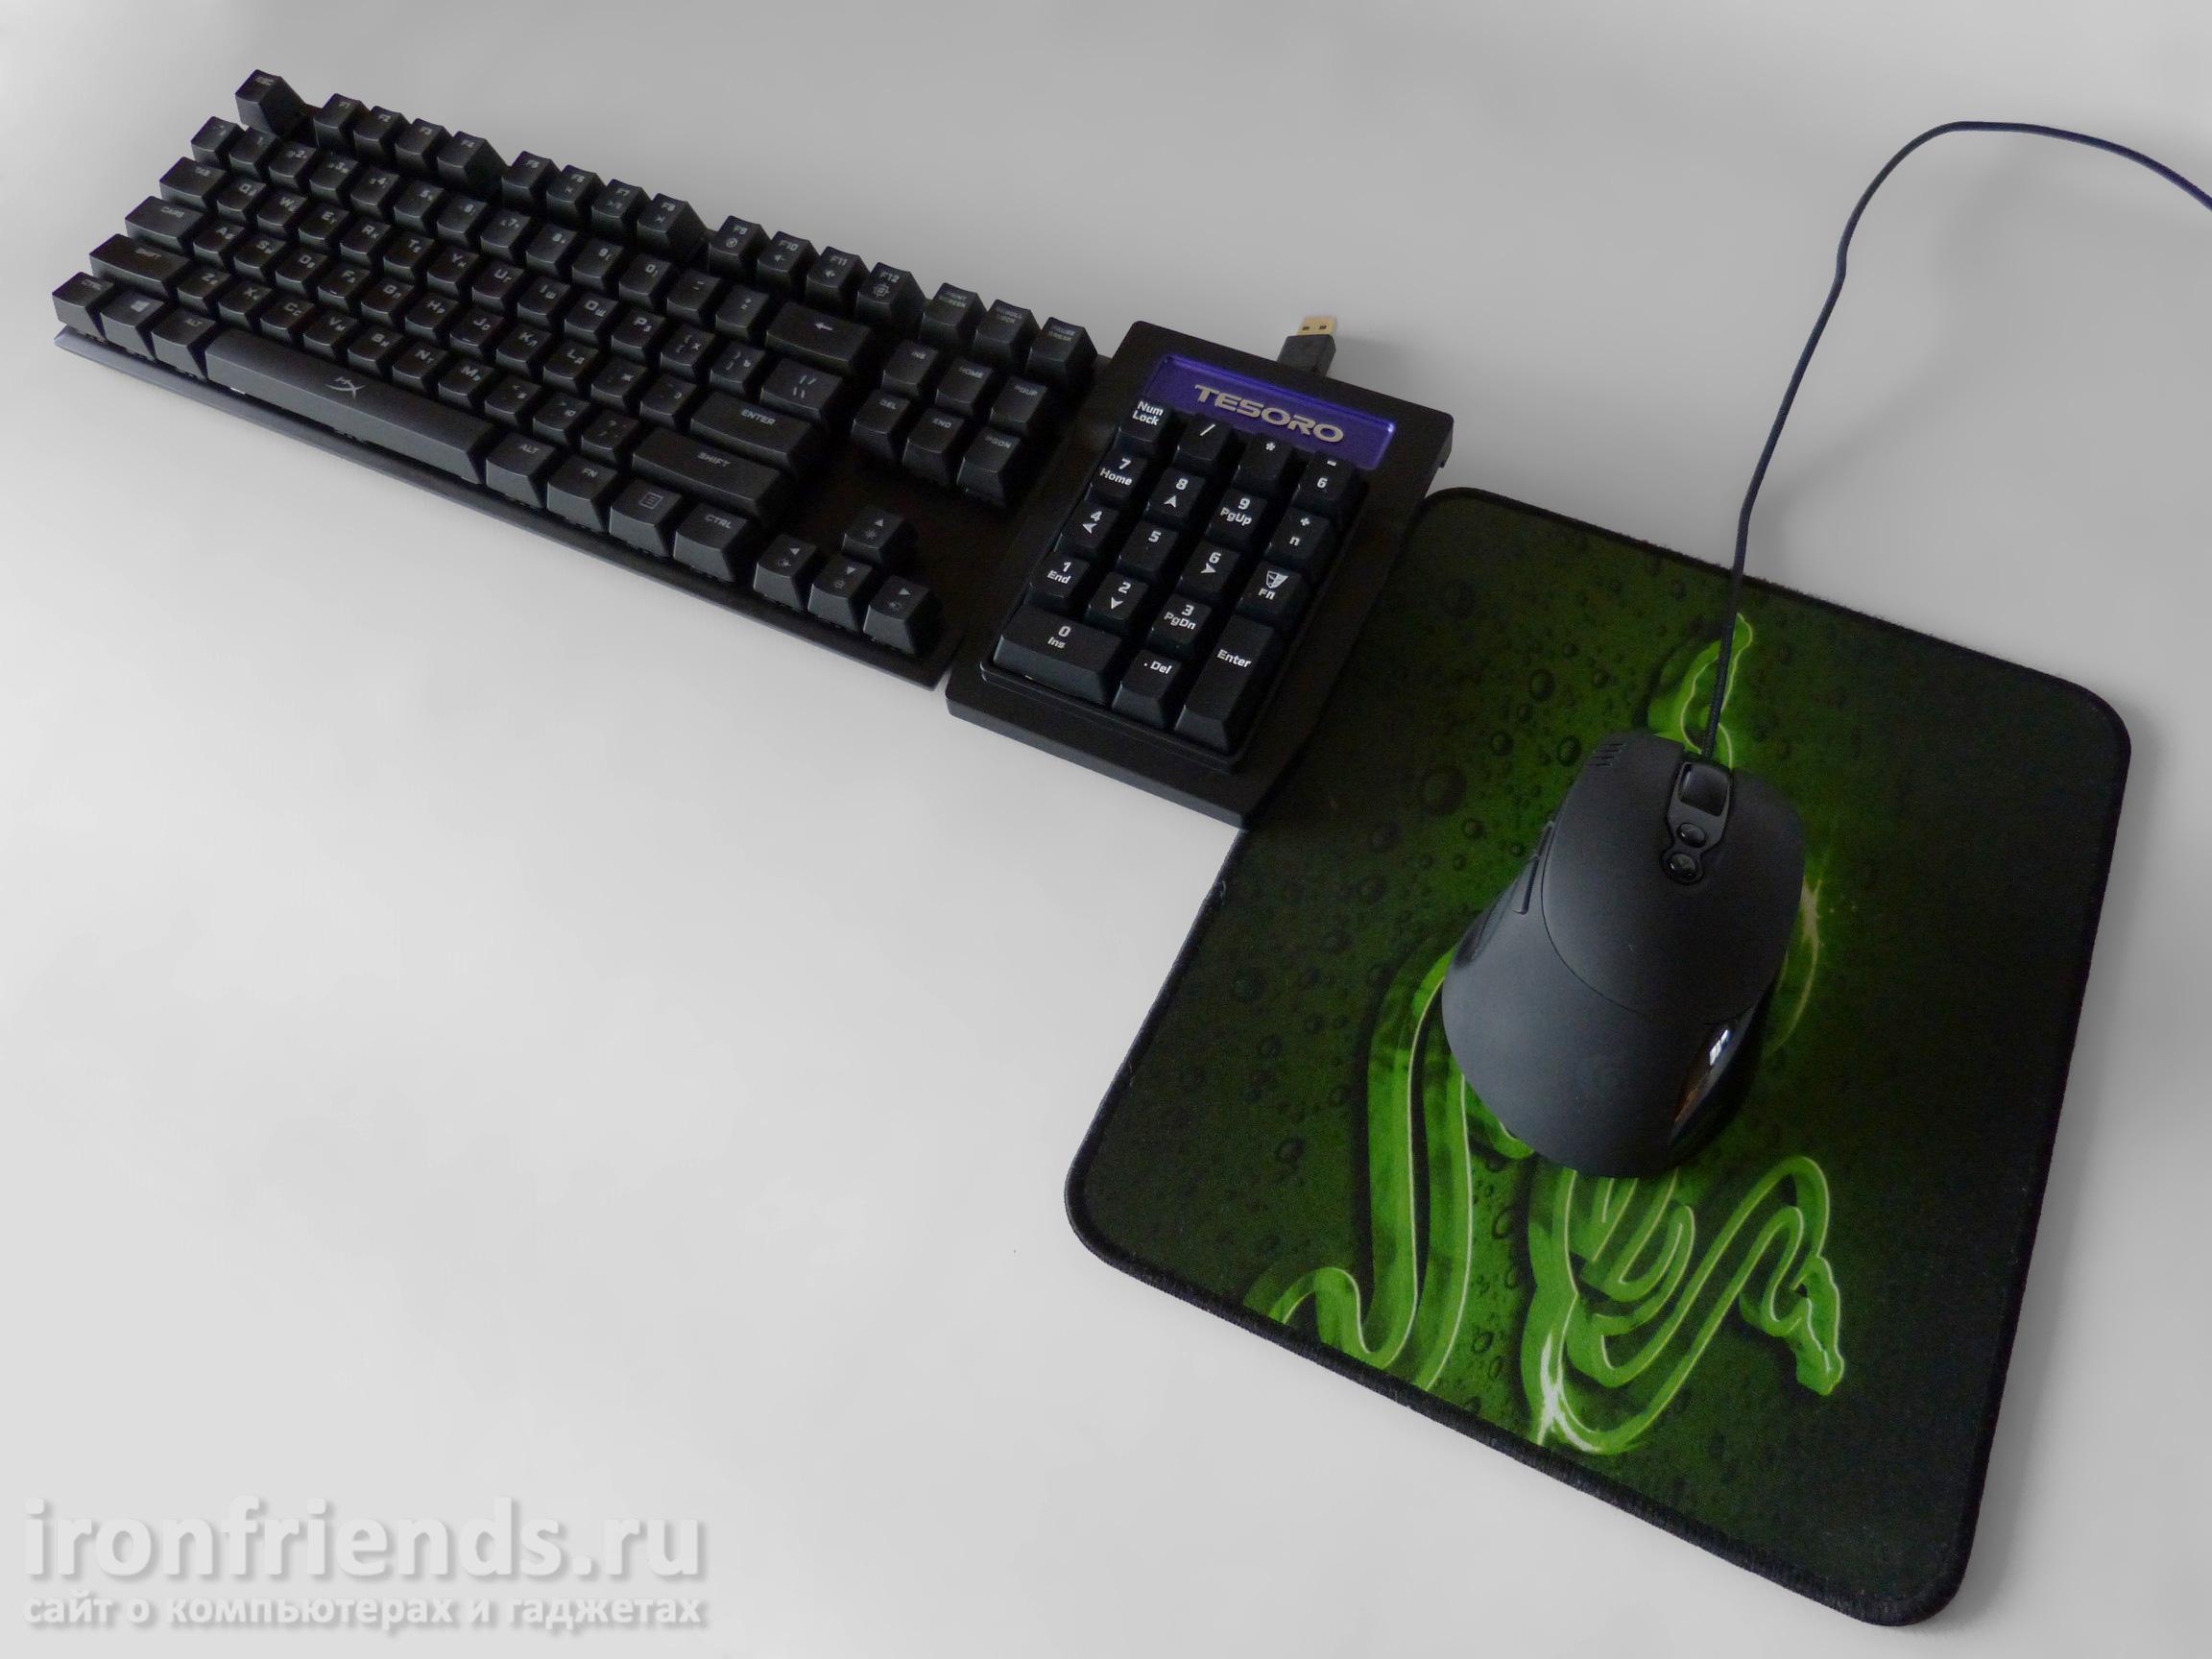 Нампад Tesoro Tizona с клавиатурой HyperX